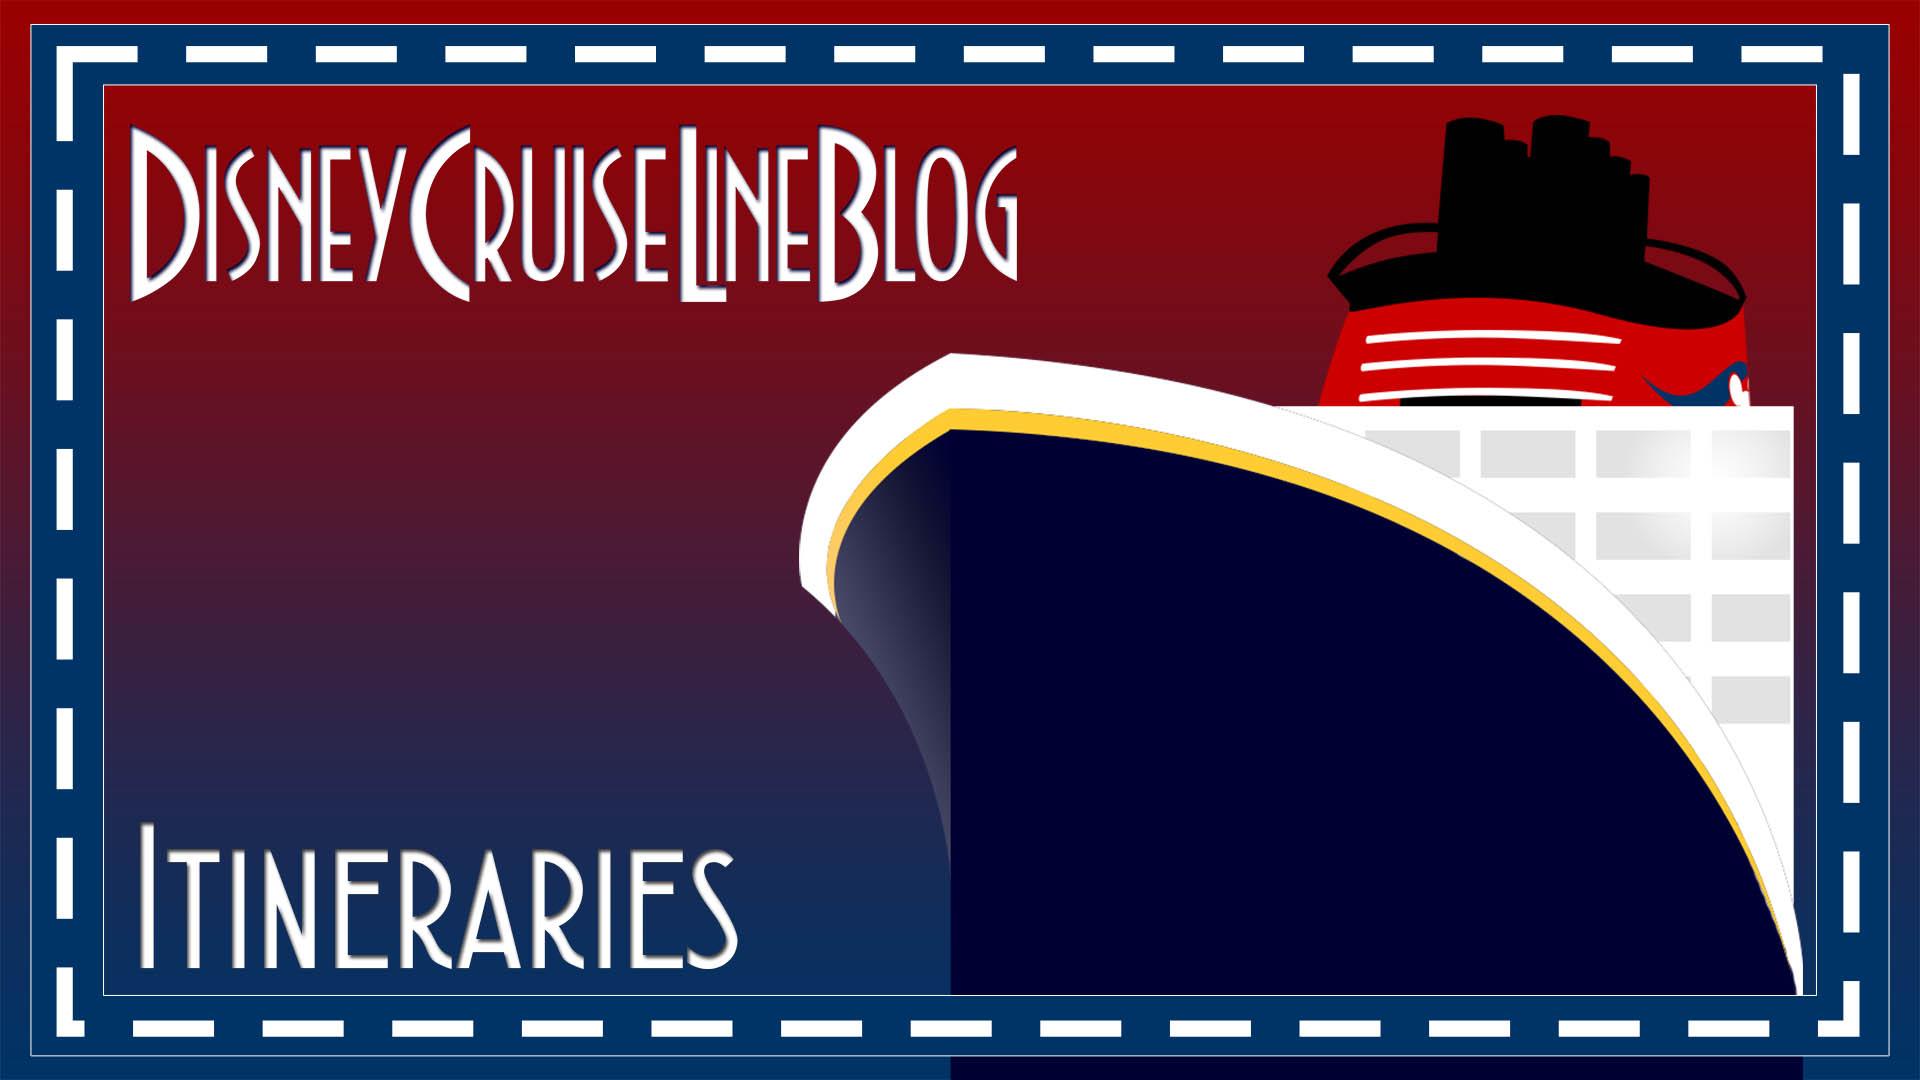 DCLBlog Itineraries